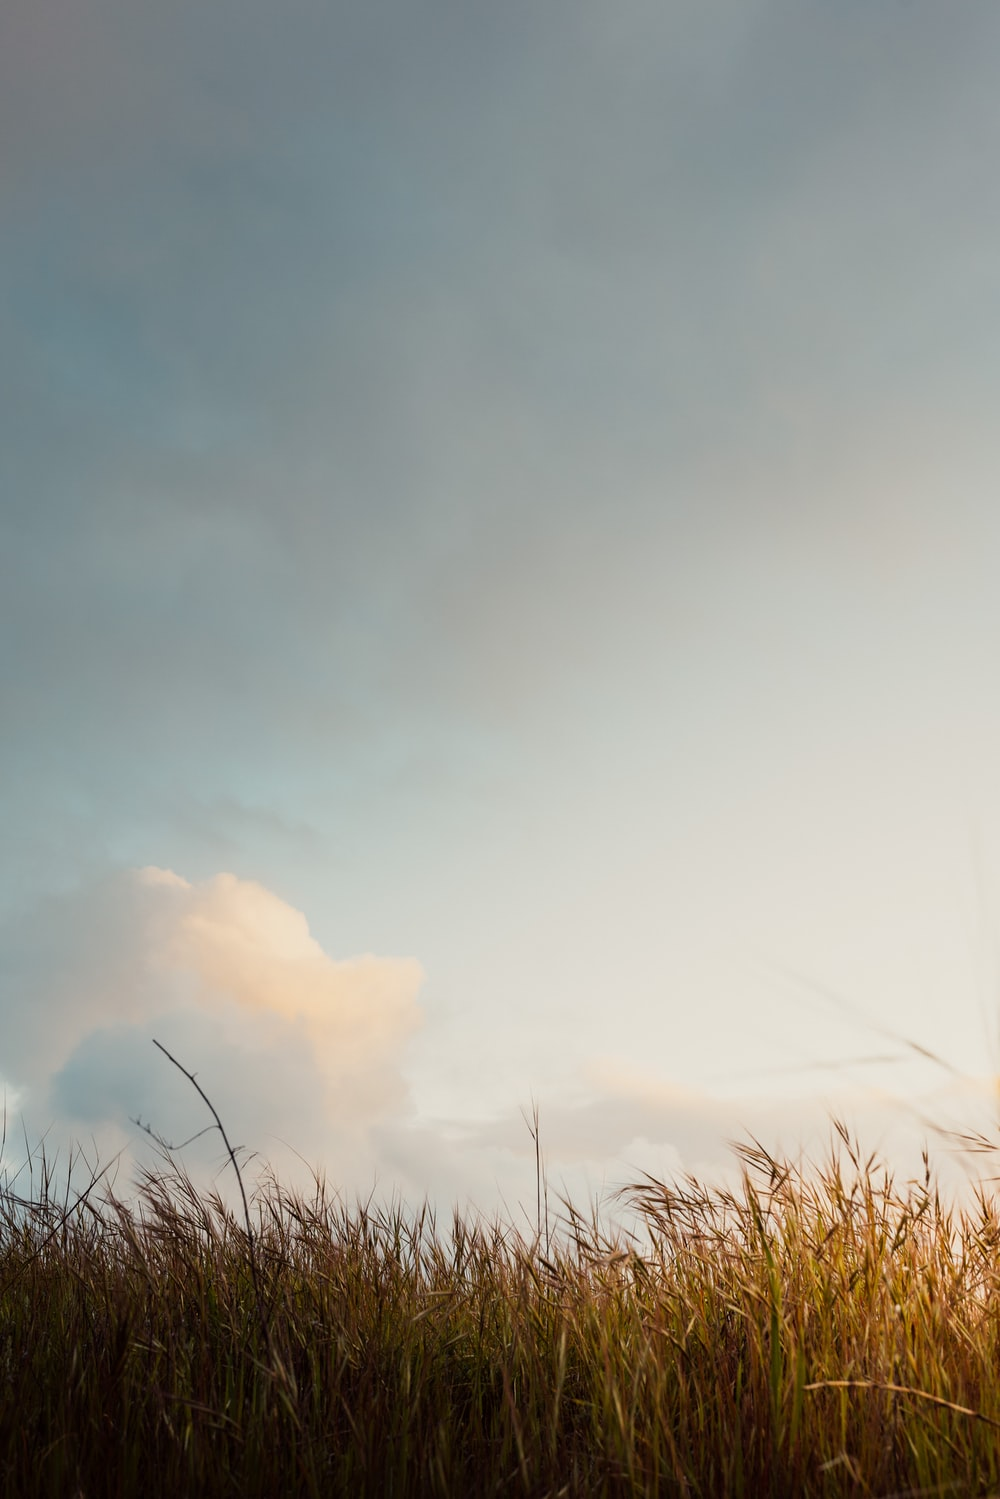 brown grass field under white cloudy sky